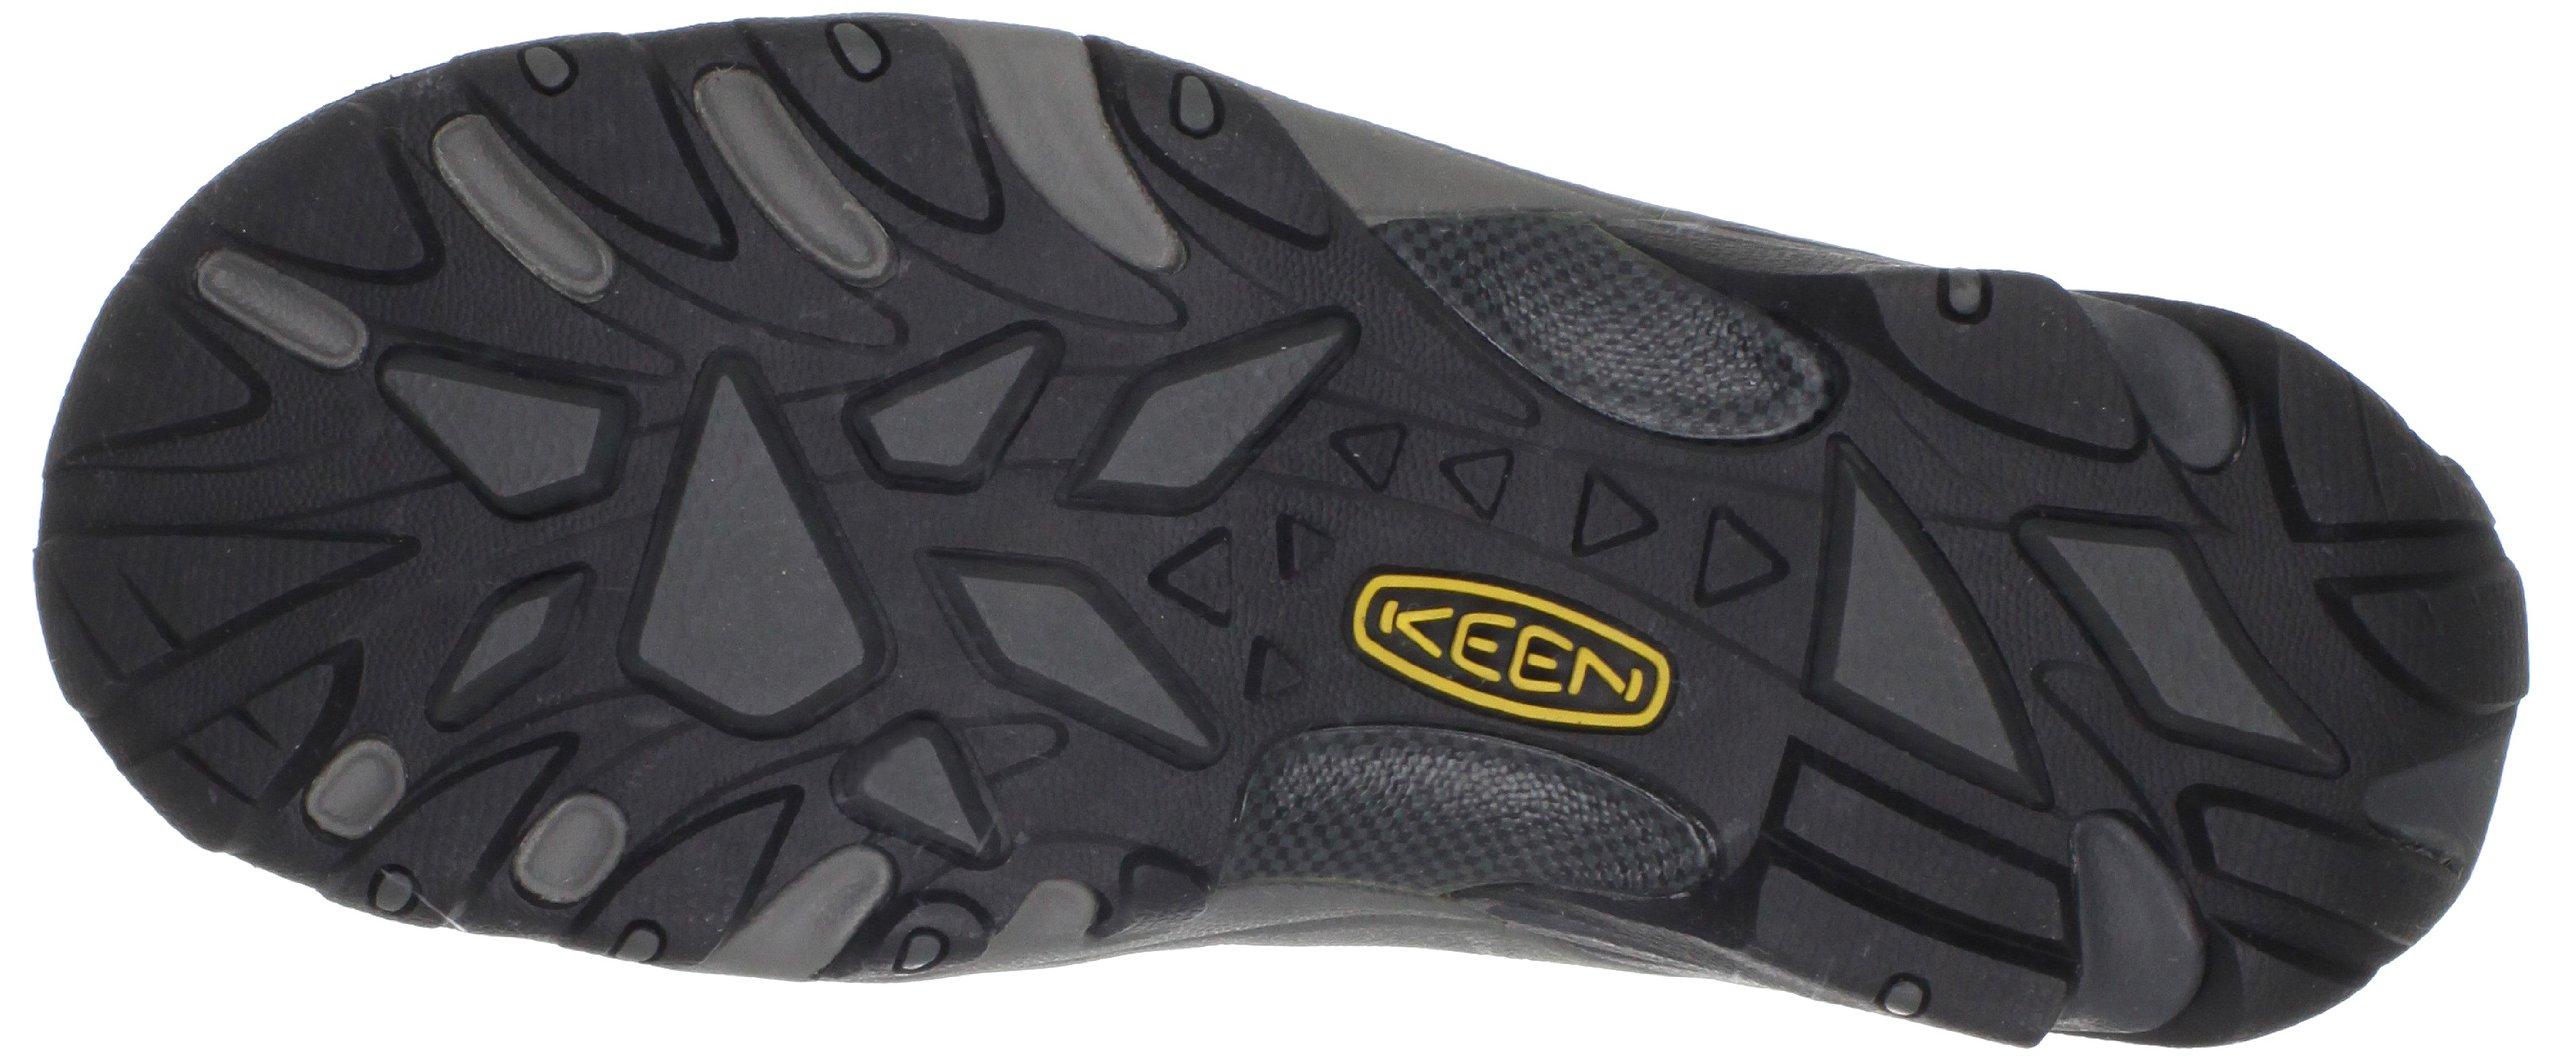 KEEN Utility Men's Atlanta Cool Steel Toe Work Shoe,Black,9.5 EE US by KEEN Utility (Image #3)